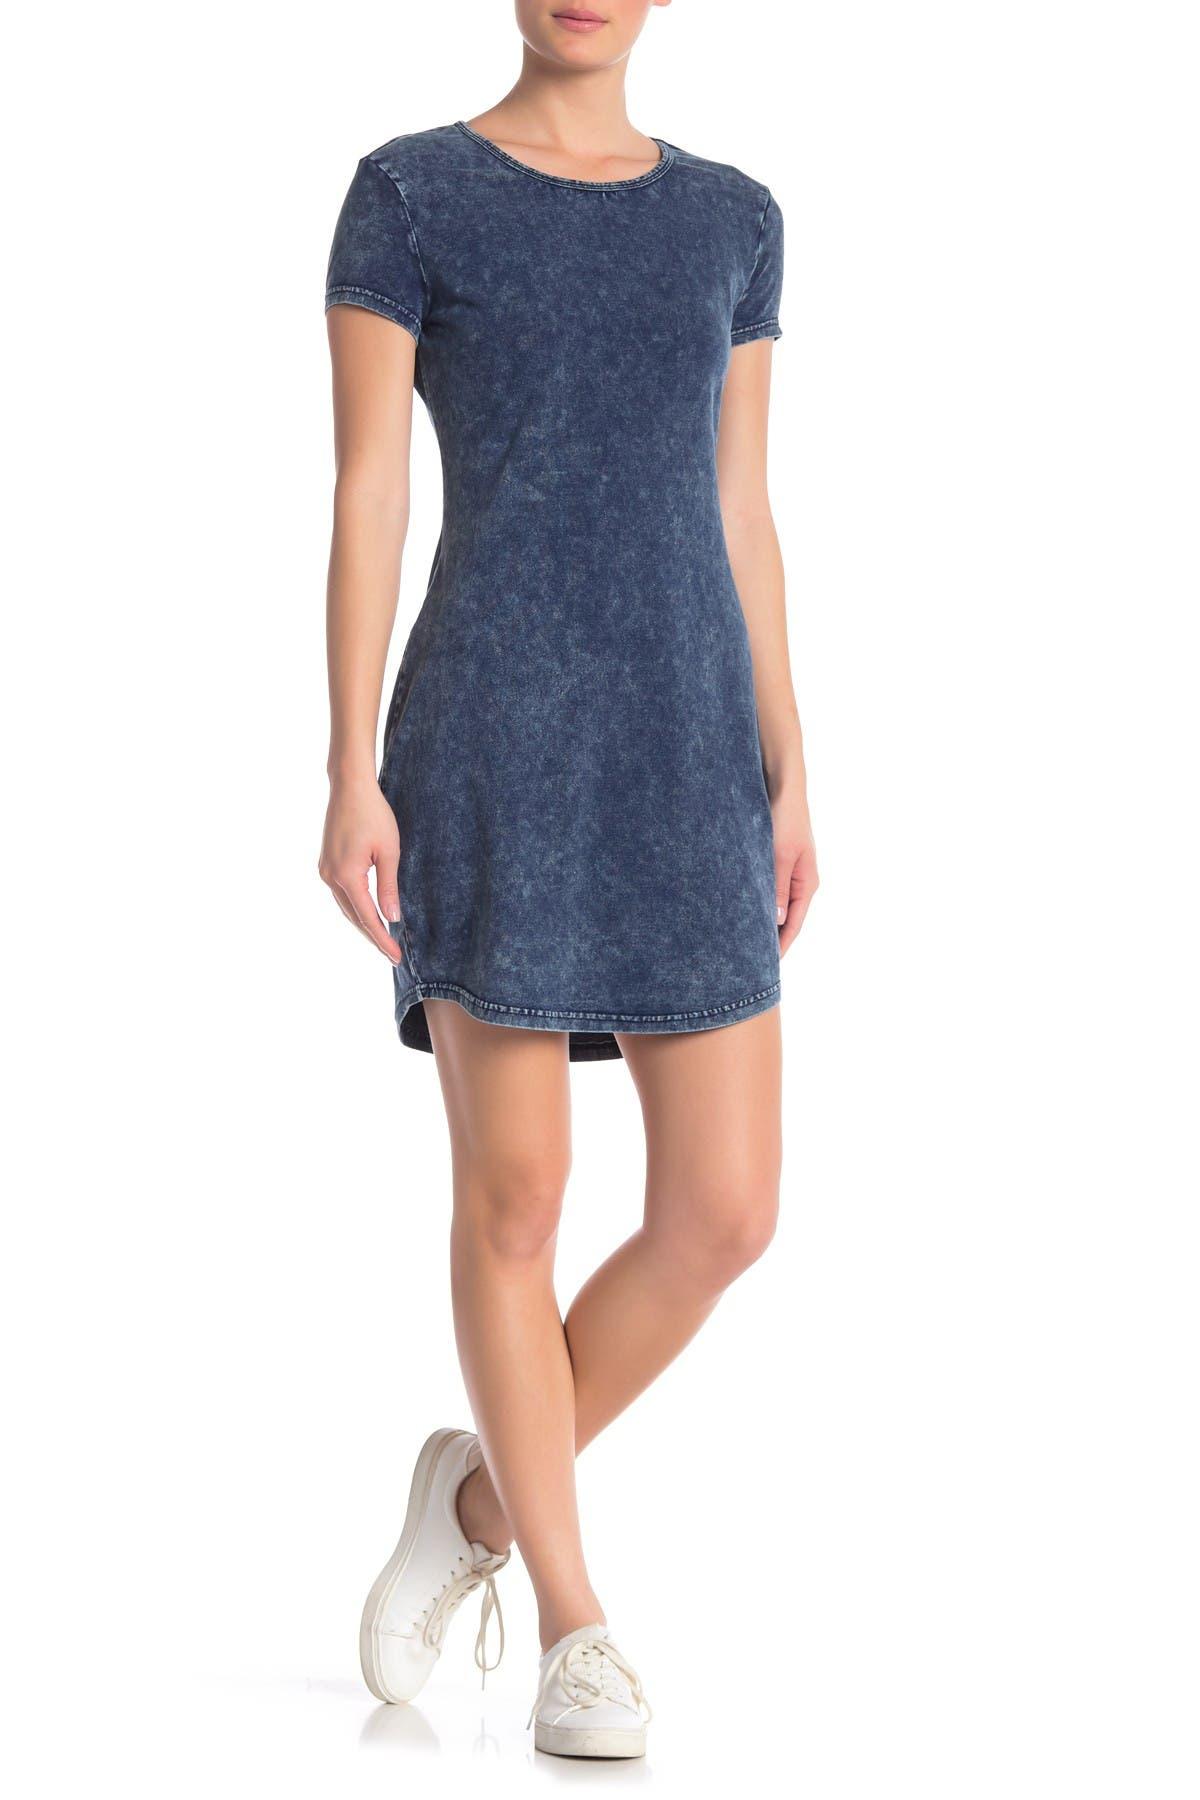 Image of RD Style Acid Wash T-Shirt Dress